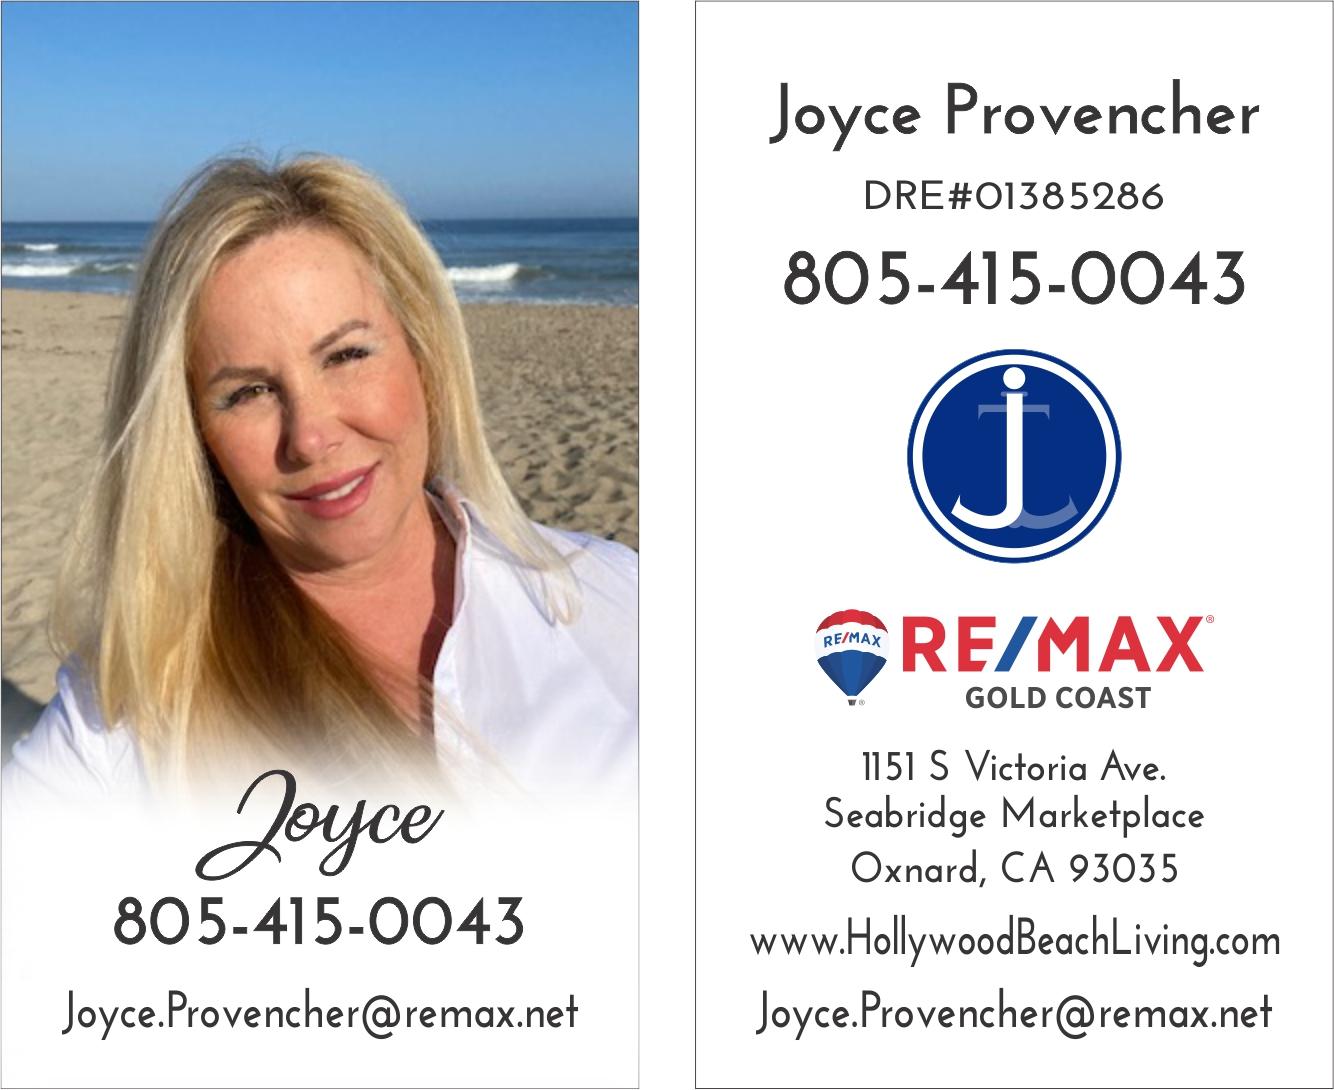 Joyce undefined Provencher